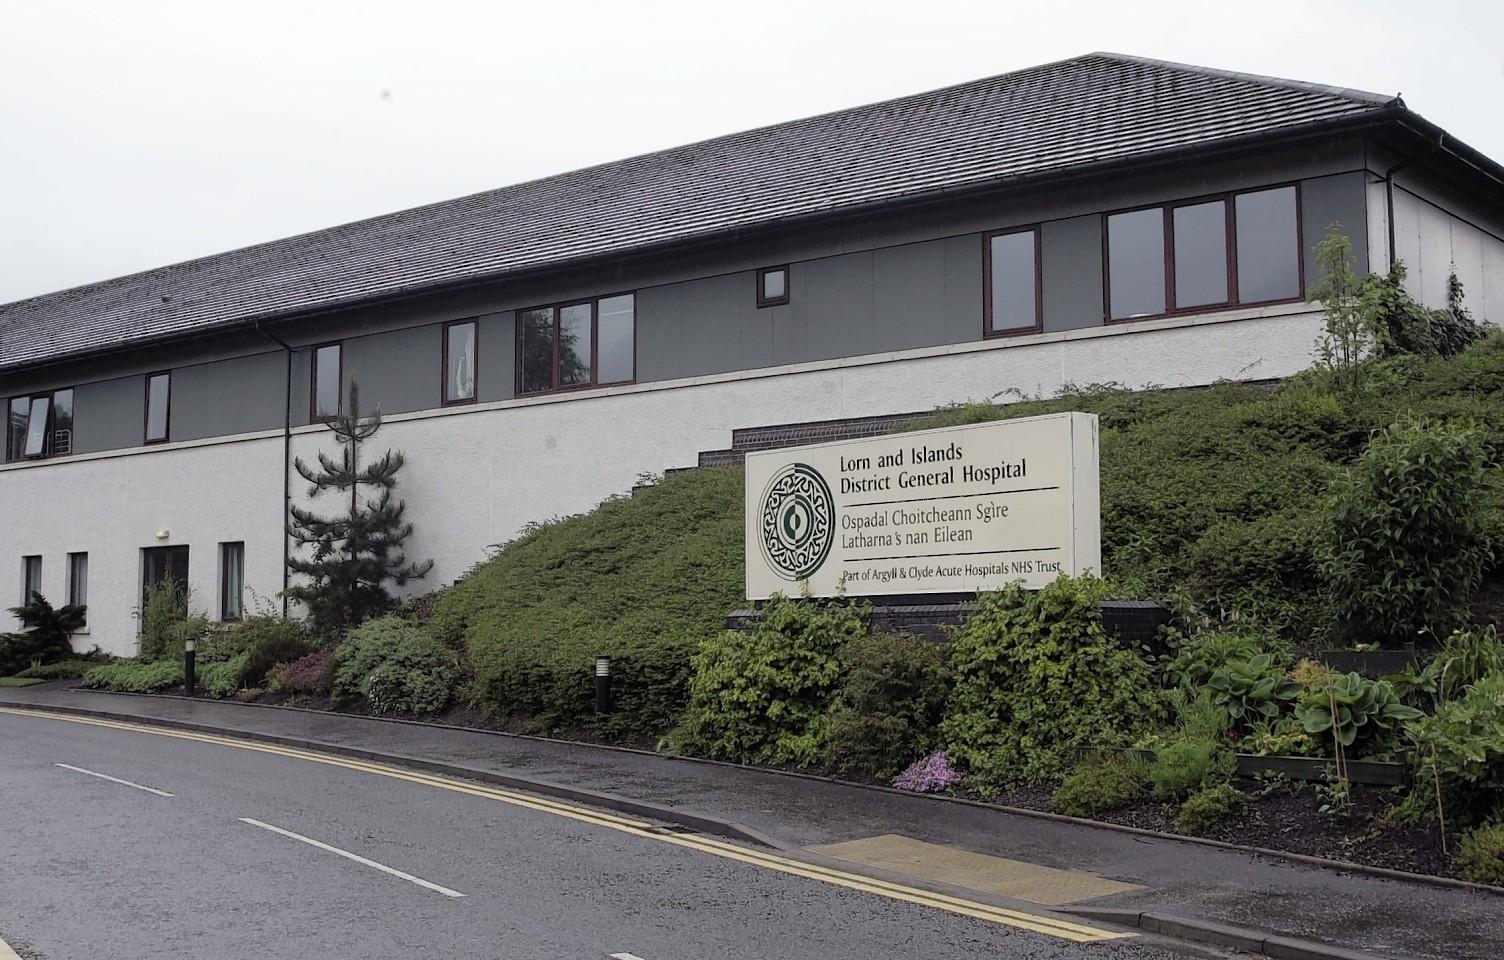 Lorn and Islands Hospital